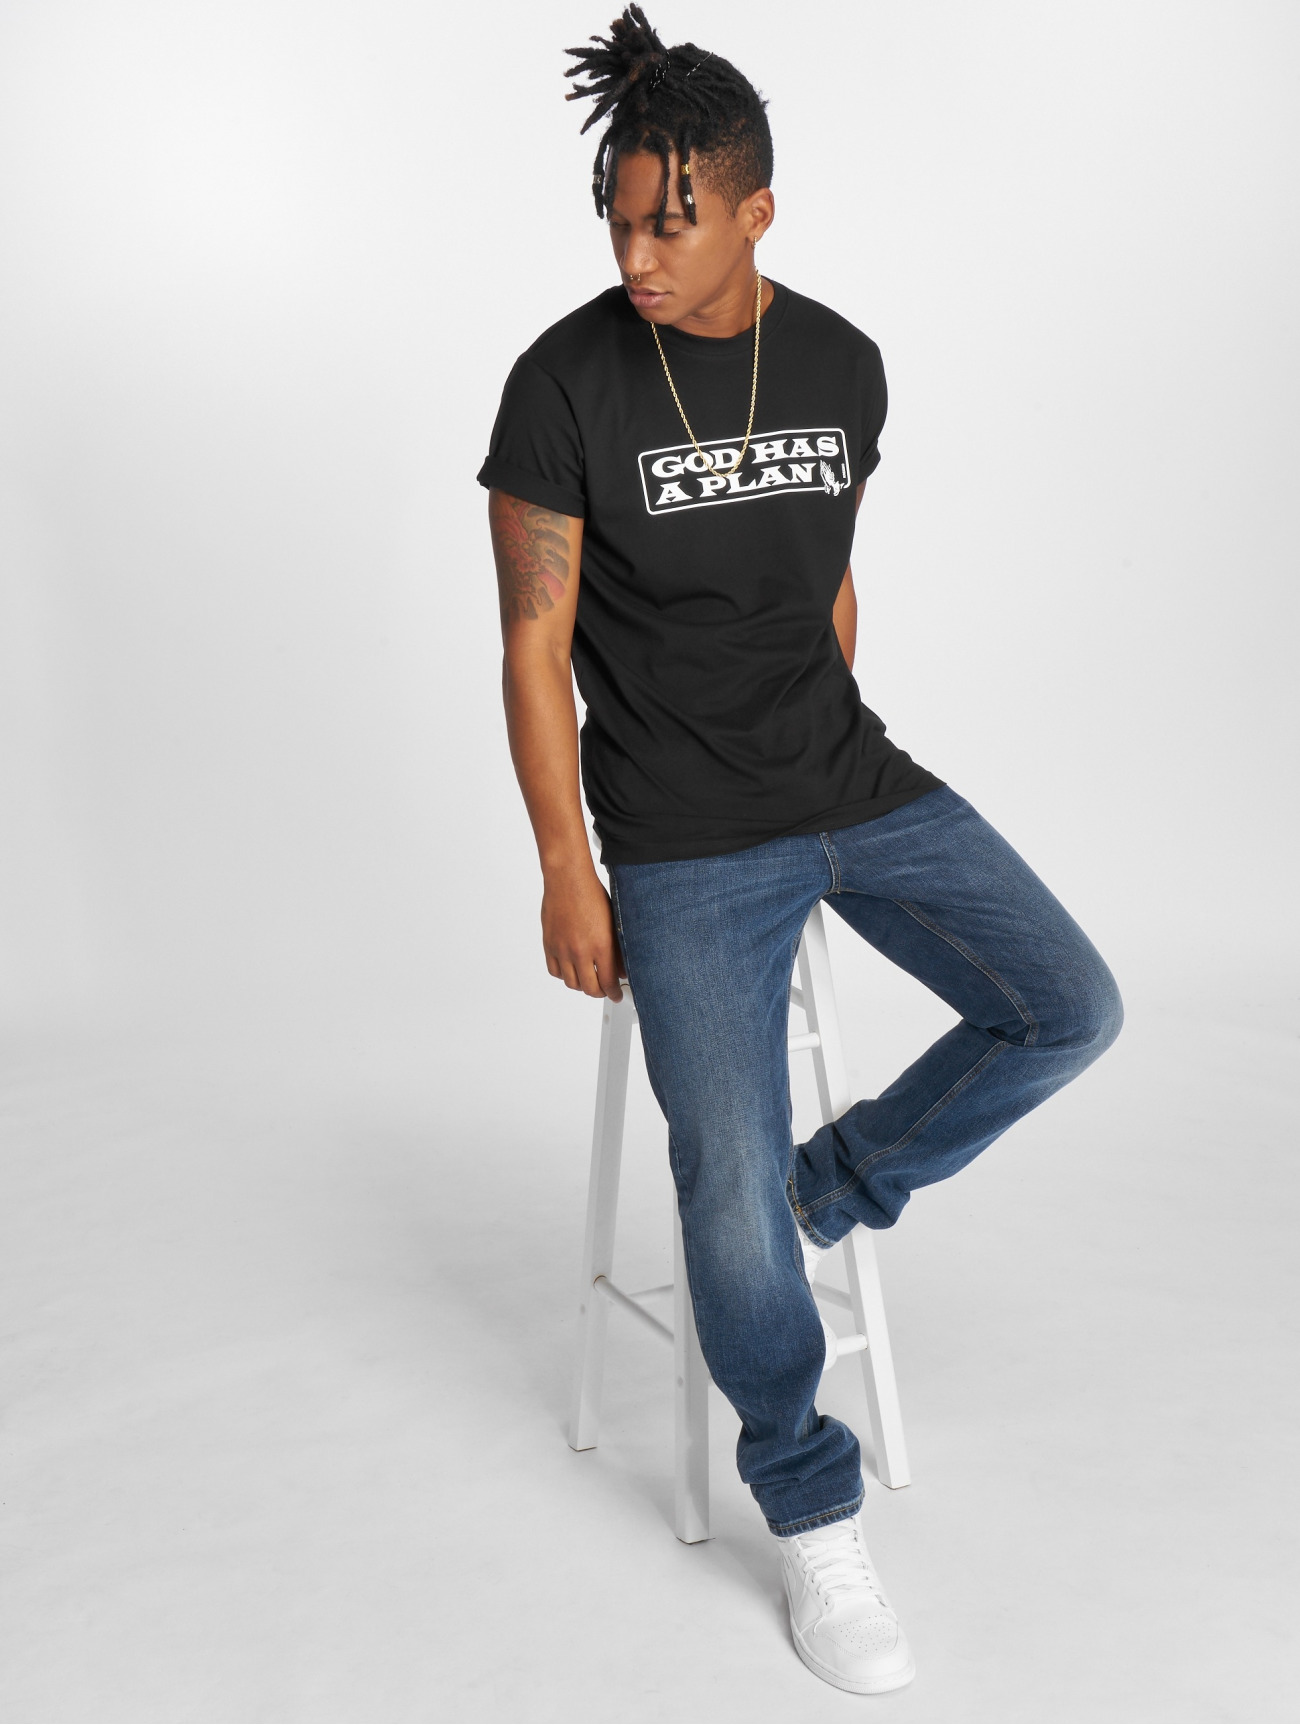 Mister Tee | God Has A Plan  noir Homme T-Shirt  574732| Homme Hauts